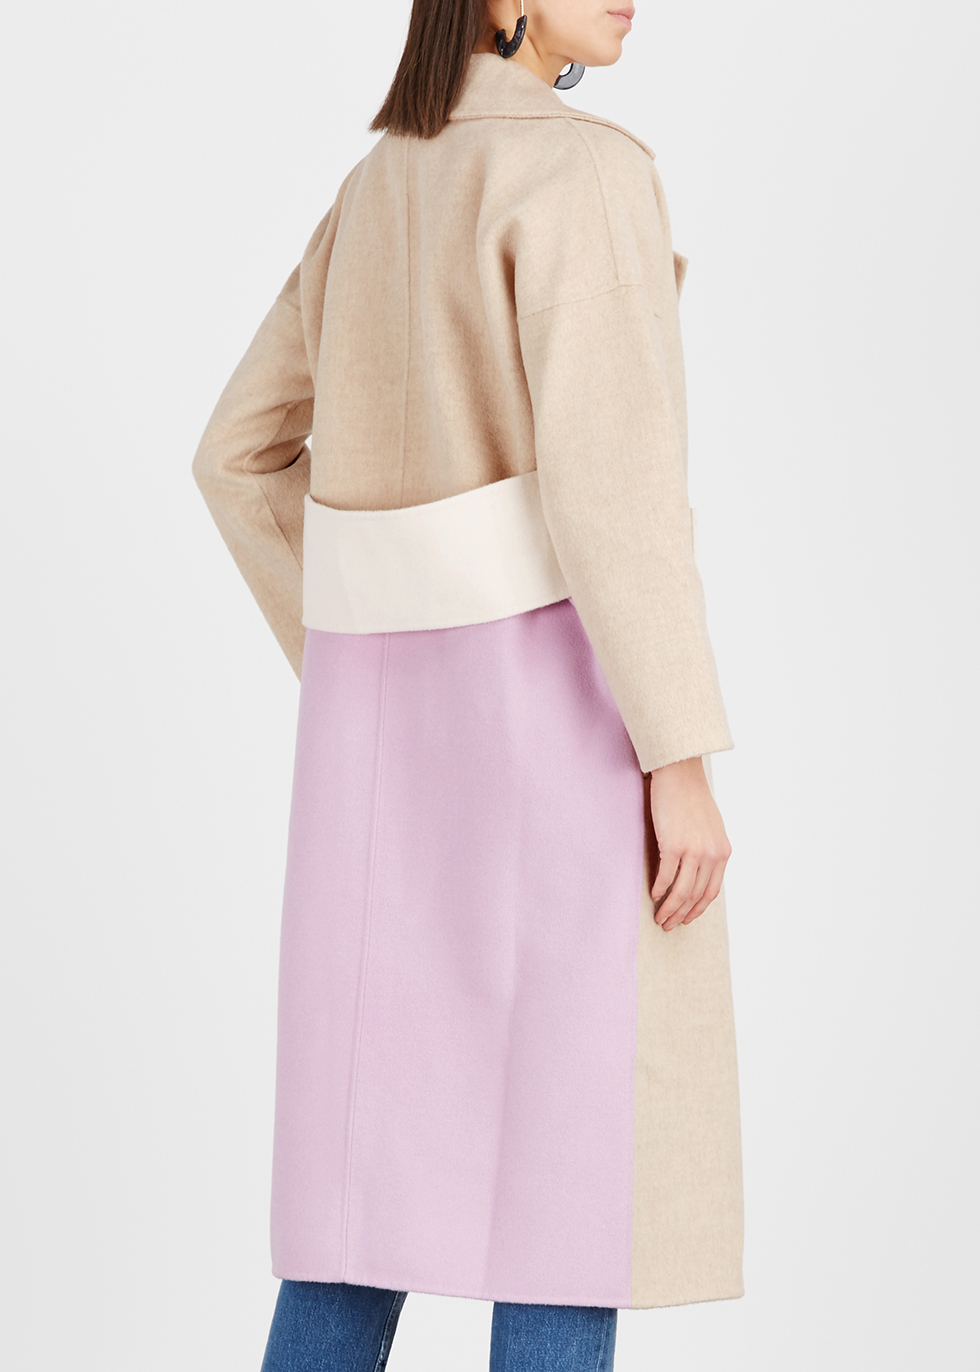 Kate colour-block wool-blend coat - Rejina Pyo